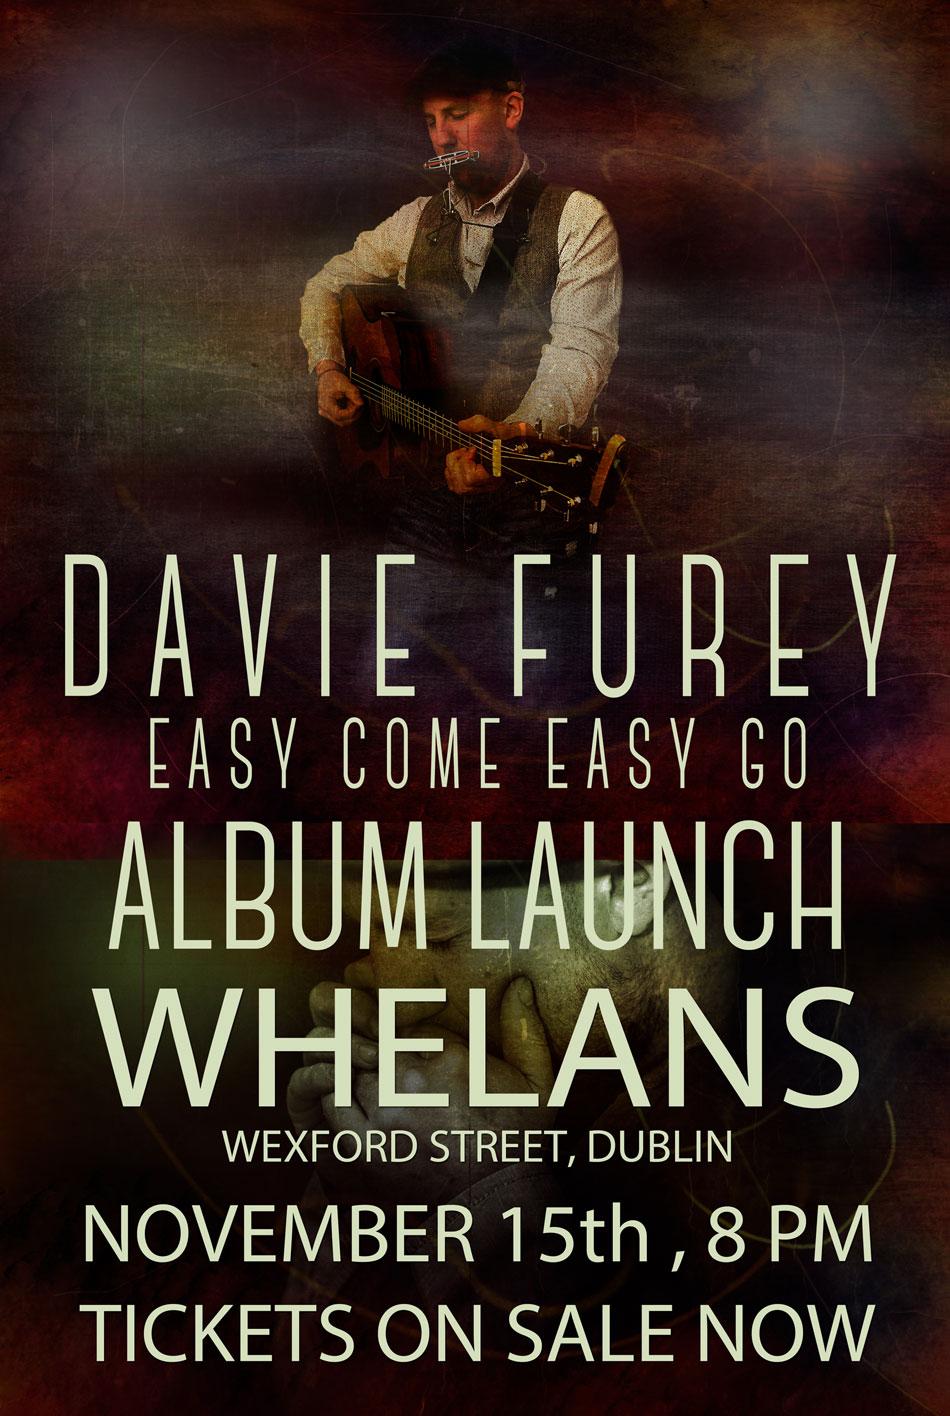 Album Launch Poster for Davie Furey Easy Come Easy Go.